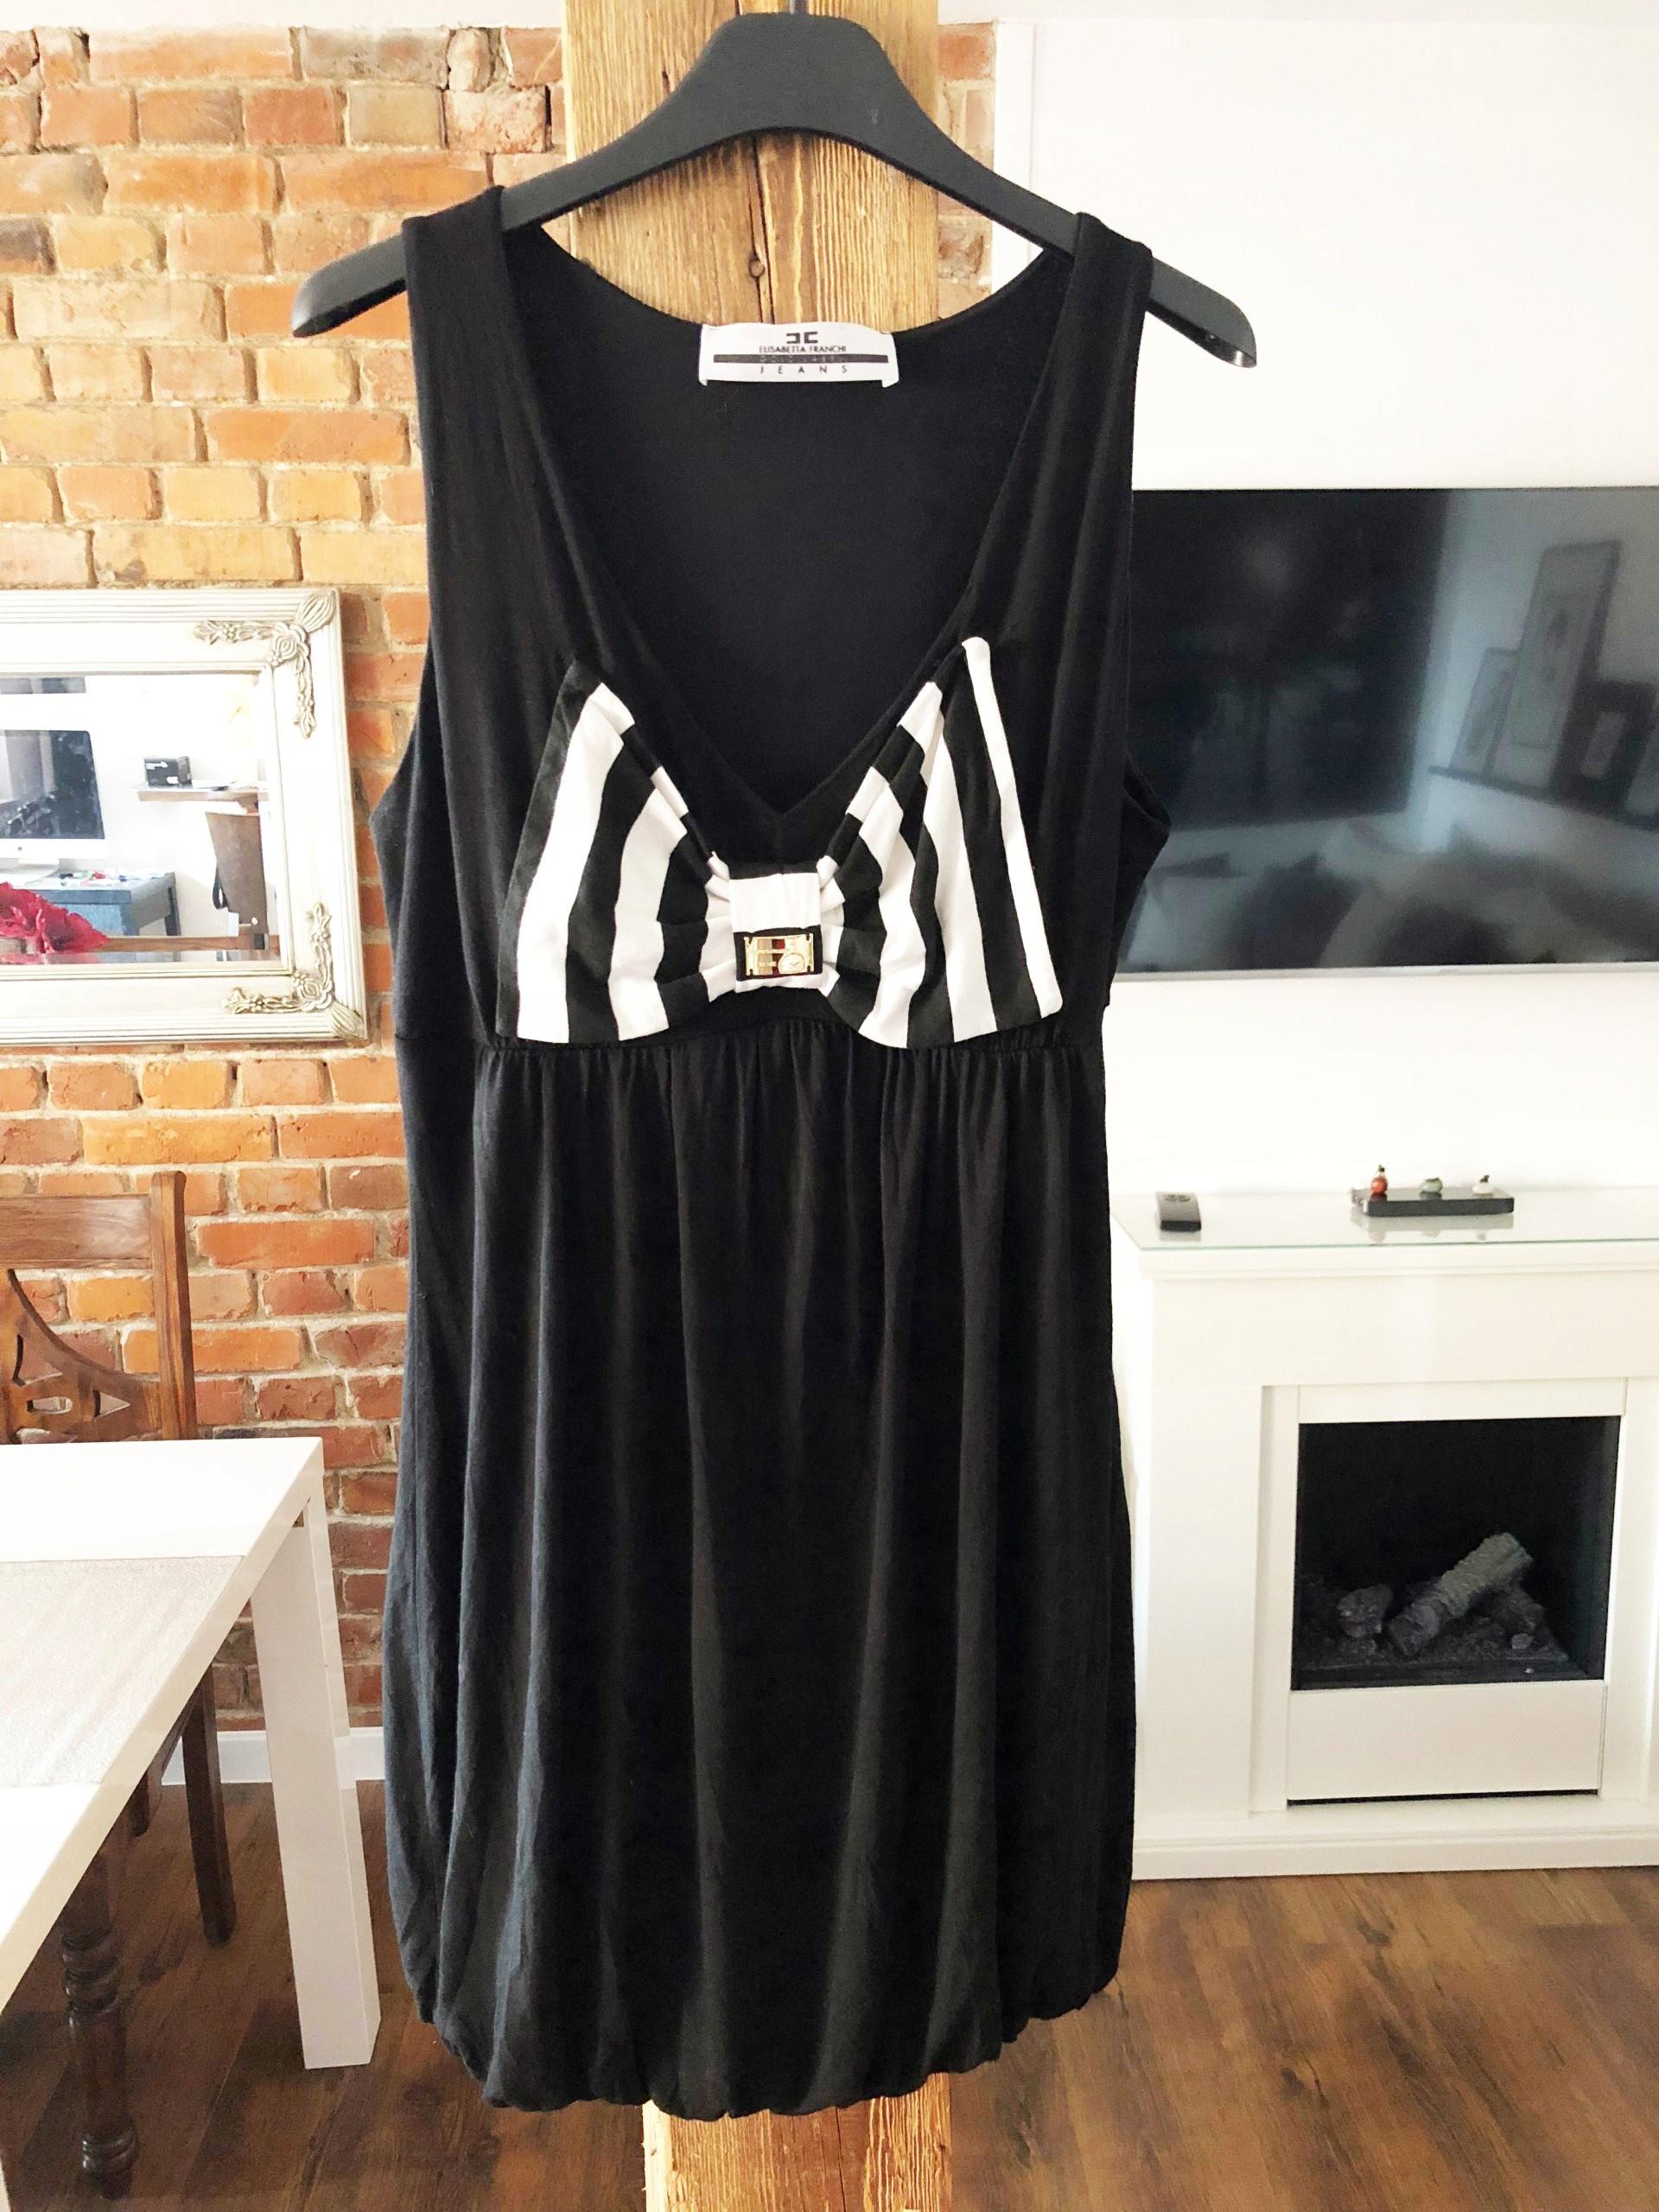 a09fdab635 ELISABETTA FRANCHI CELYN B sukienka M 38 - 7410037535 - oficjalne ...